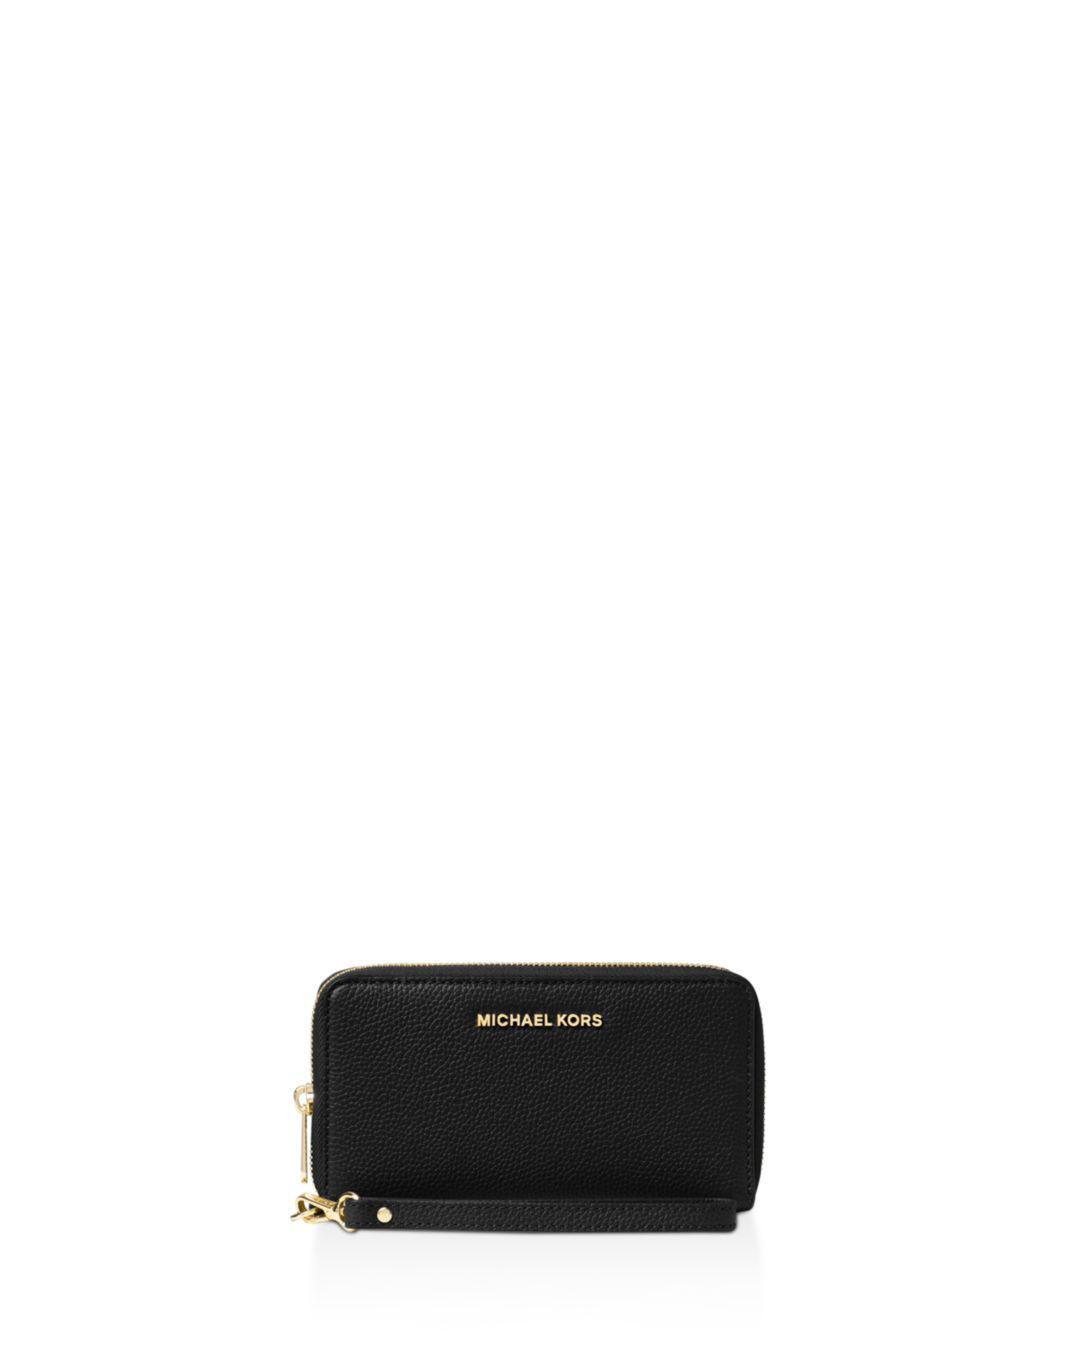 b673a6b2077d MICHAEL Michael Kors. Women's Black Flat Multi-function Large Leather  Smartphone Wristlet